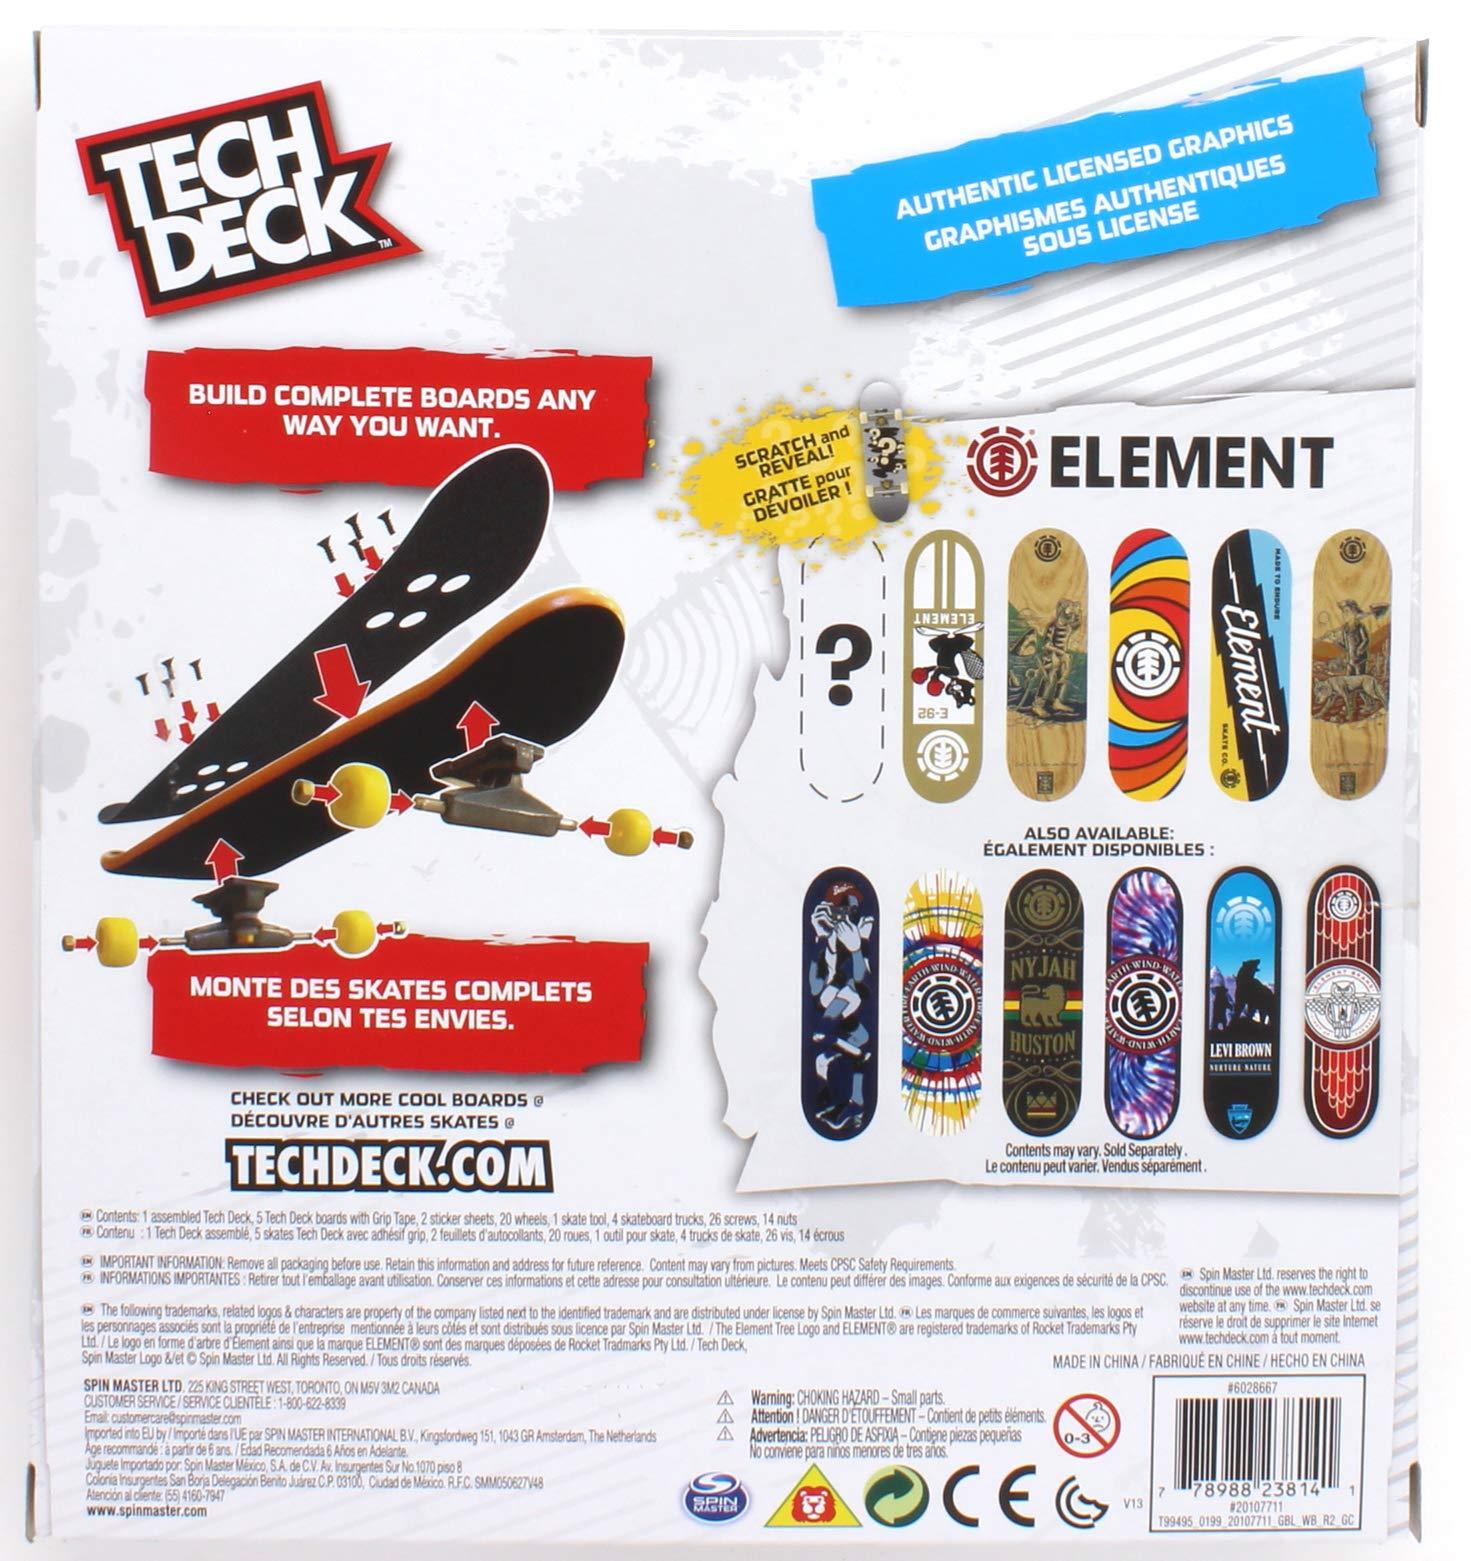 Tech Deck Element Skateboards Sk8shop Bonus Pack with 6 Fingerboards by Tech Deck Element (Image #1)